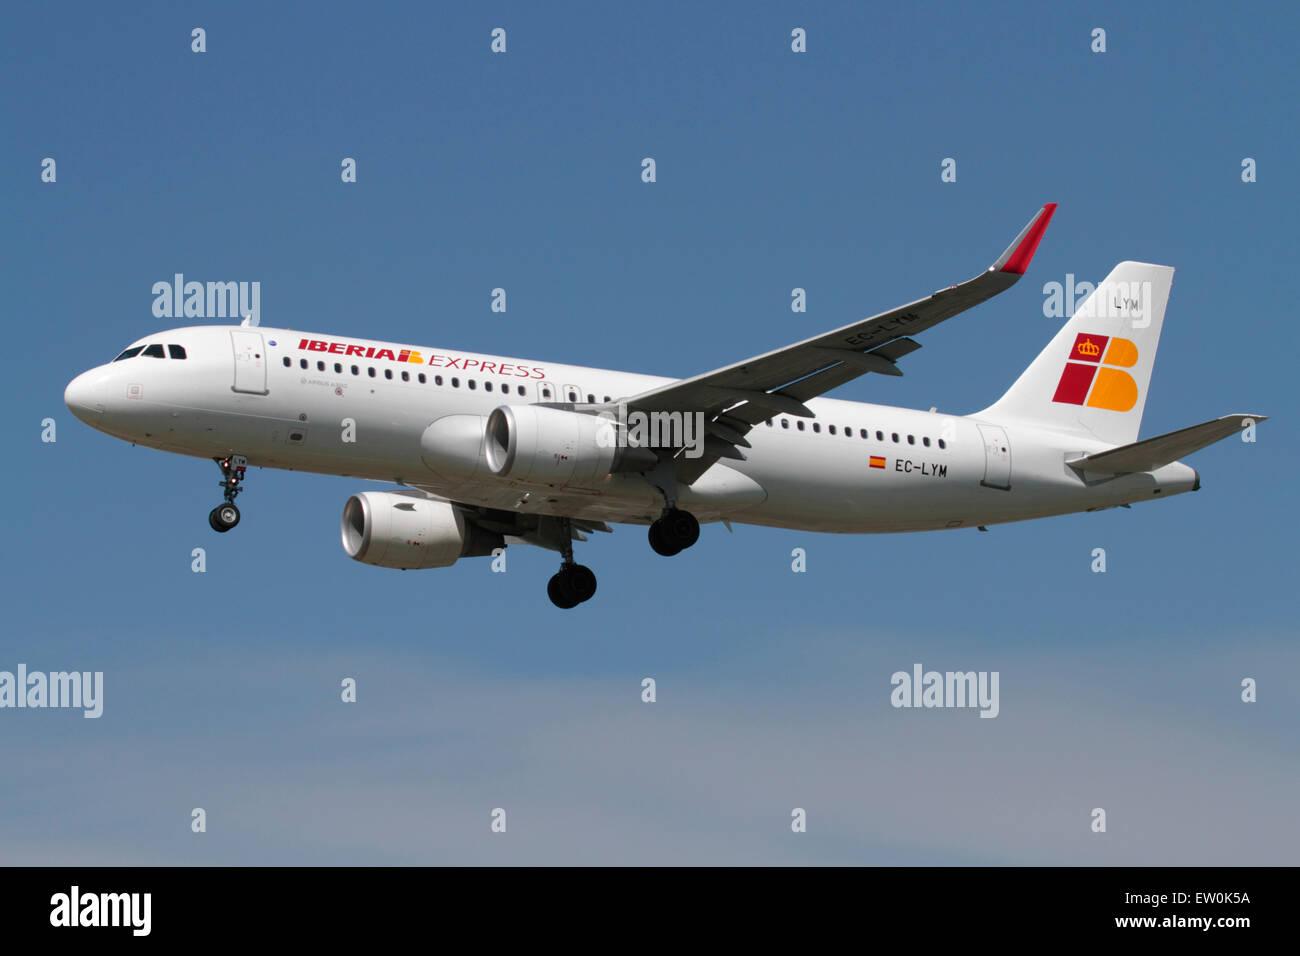 Kommerzielle Luftfahrt. Iberia Express Airbus A320 Airliner auf Ansatz Stockbild